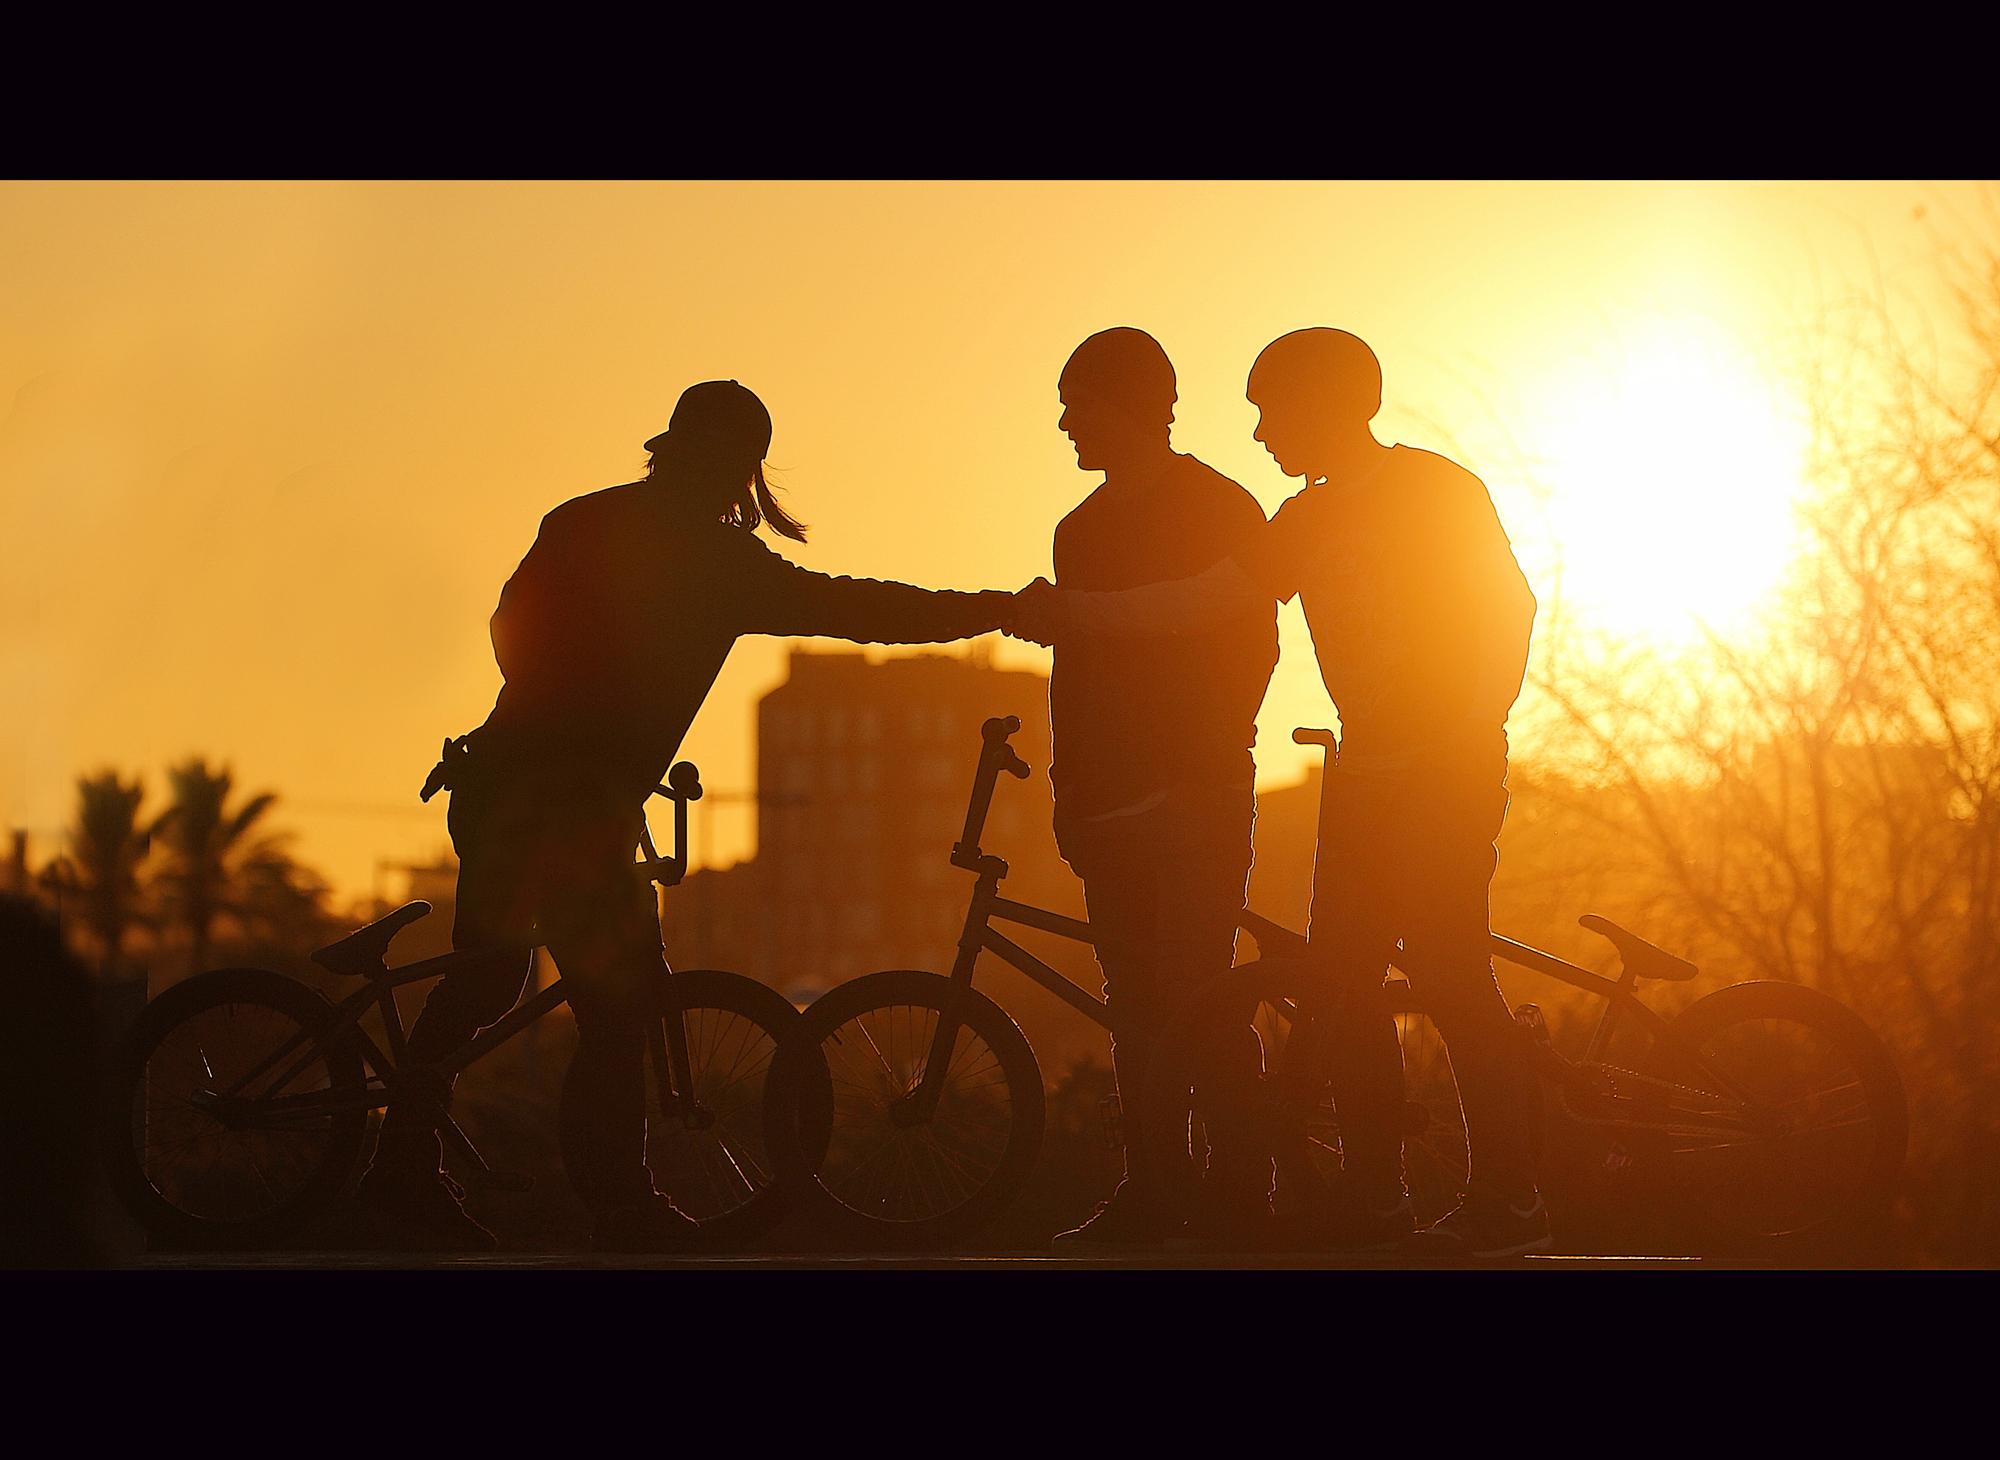 Wallpaper Sunlight Sport Sunset Street Bicycle Urban Love